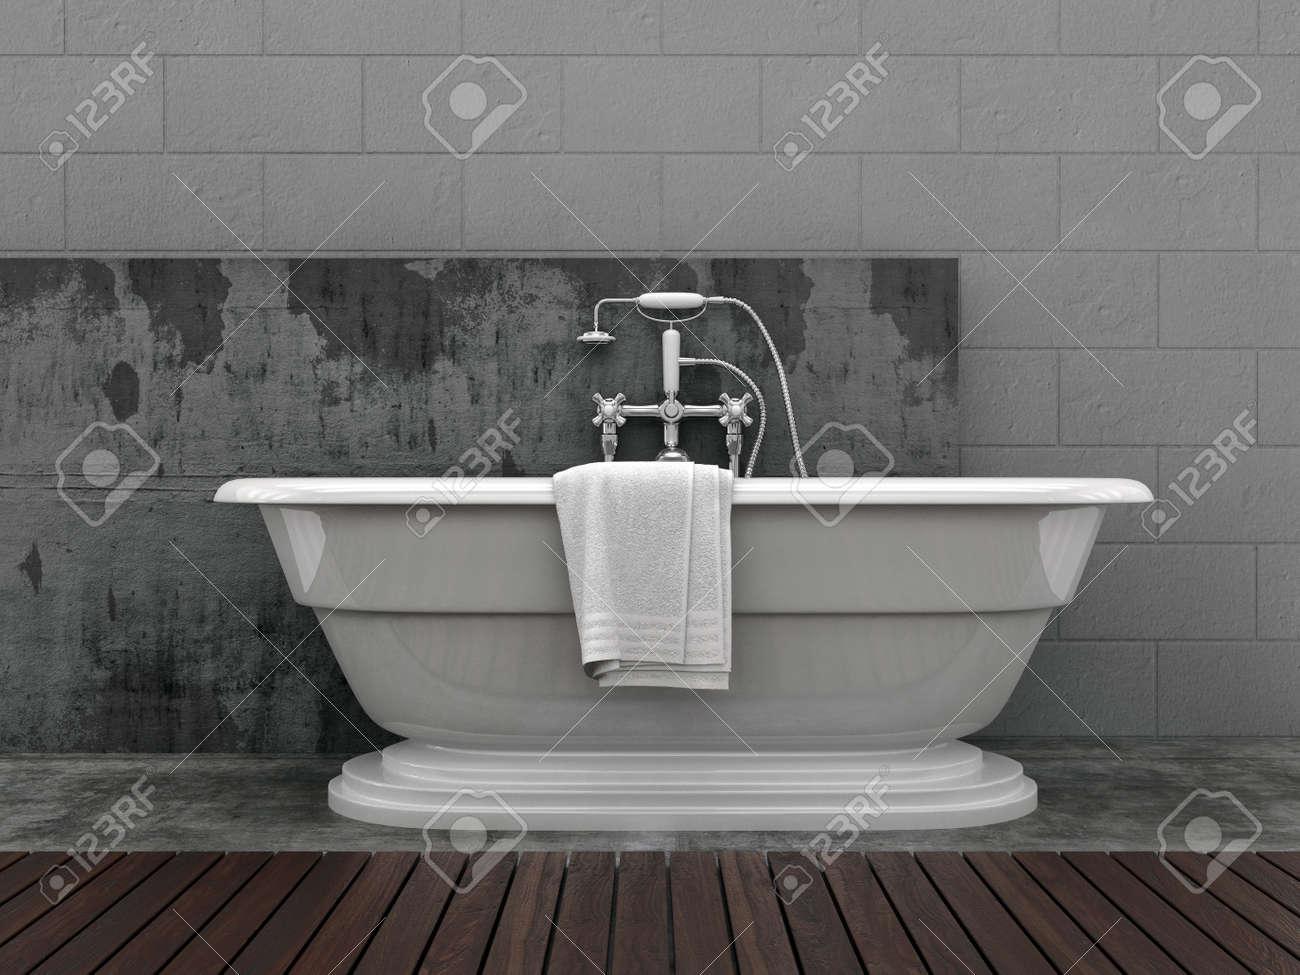 Design vasche da bagno economiche : 24 best vasche da bagno images on pinterest | jacuzzi, bathtubs ...